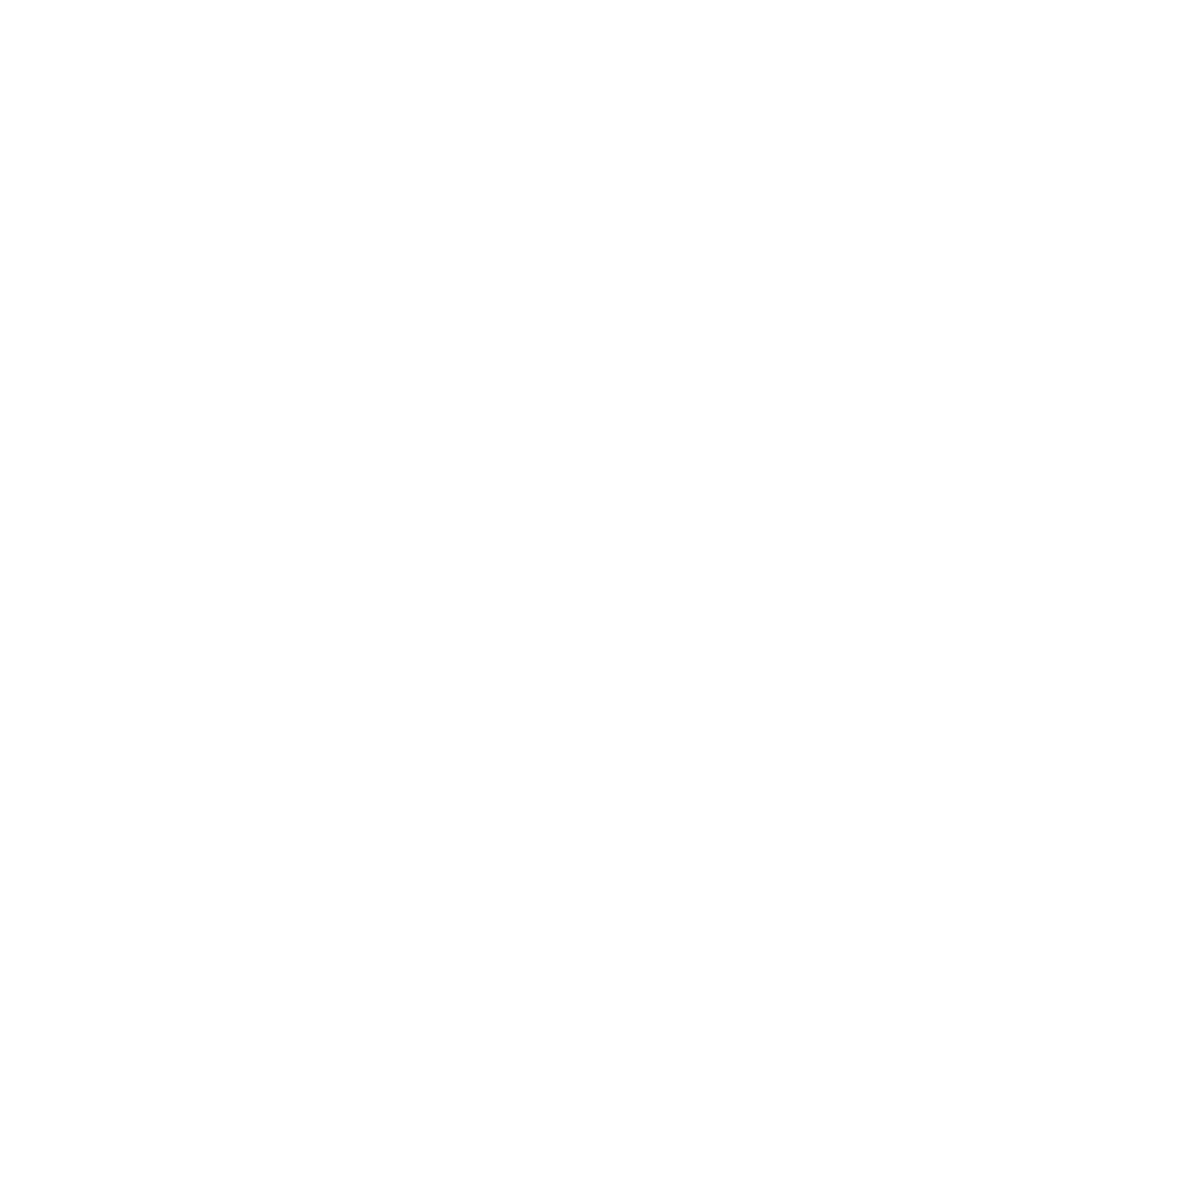 LK Logo by Chris Bramford - Dribbble